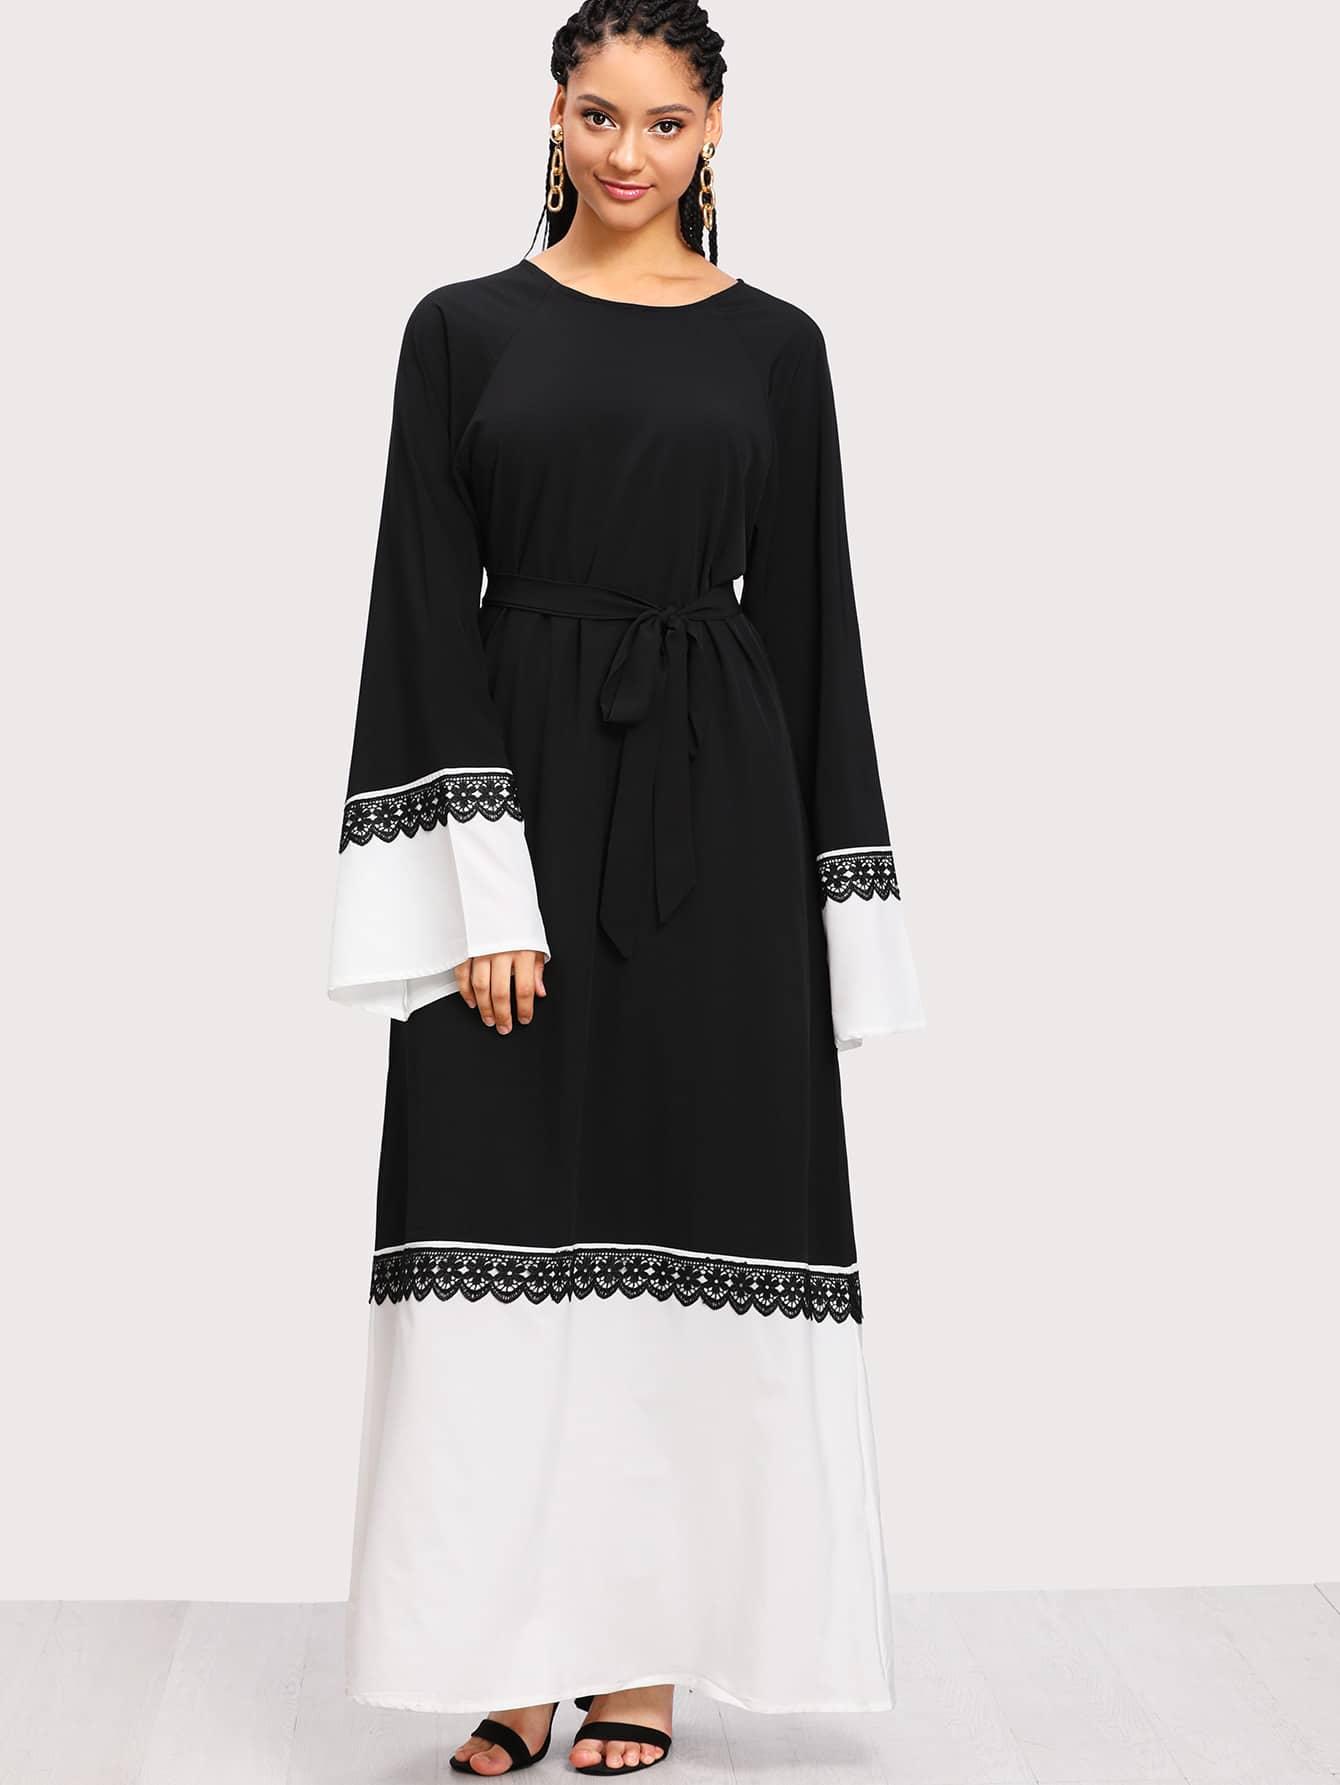 Contrast Crochet Lace Two Tone Long Hijab Dress